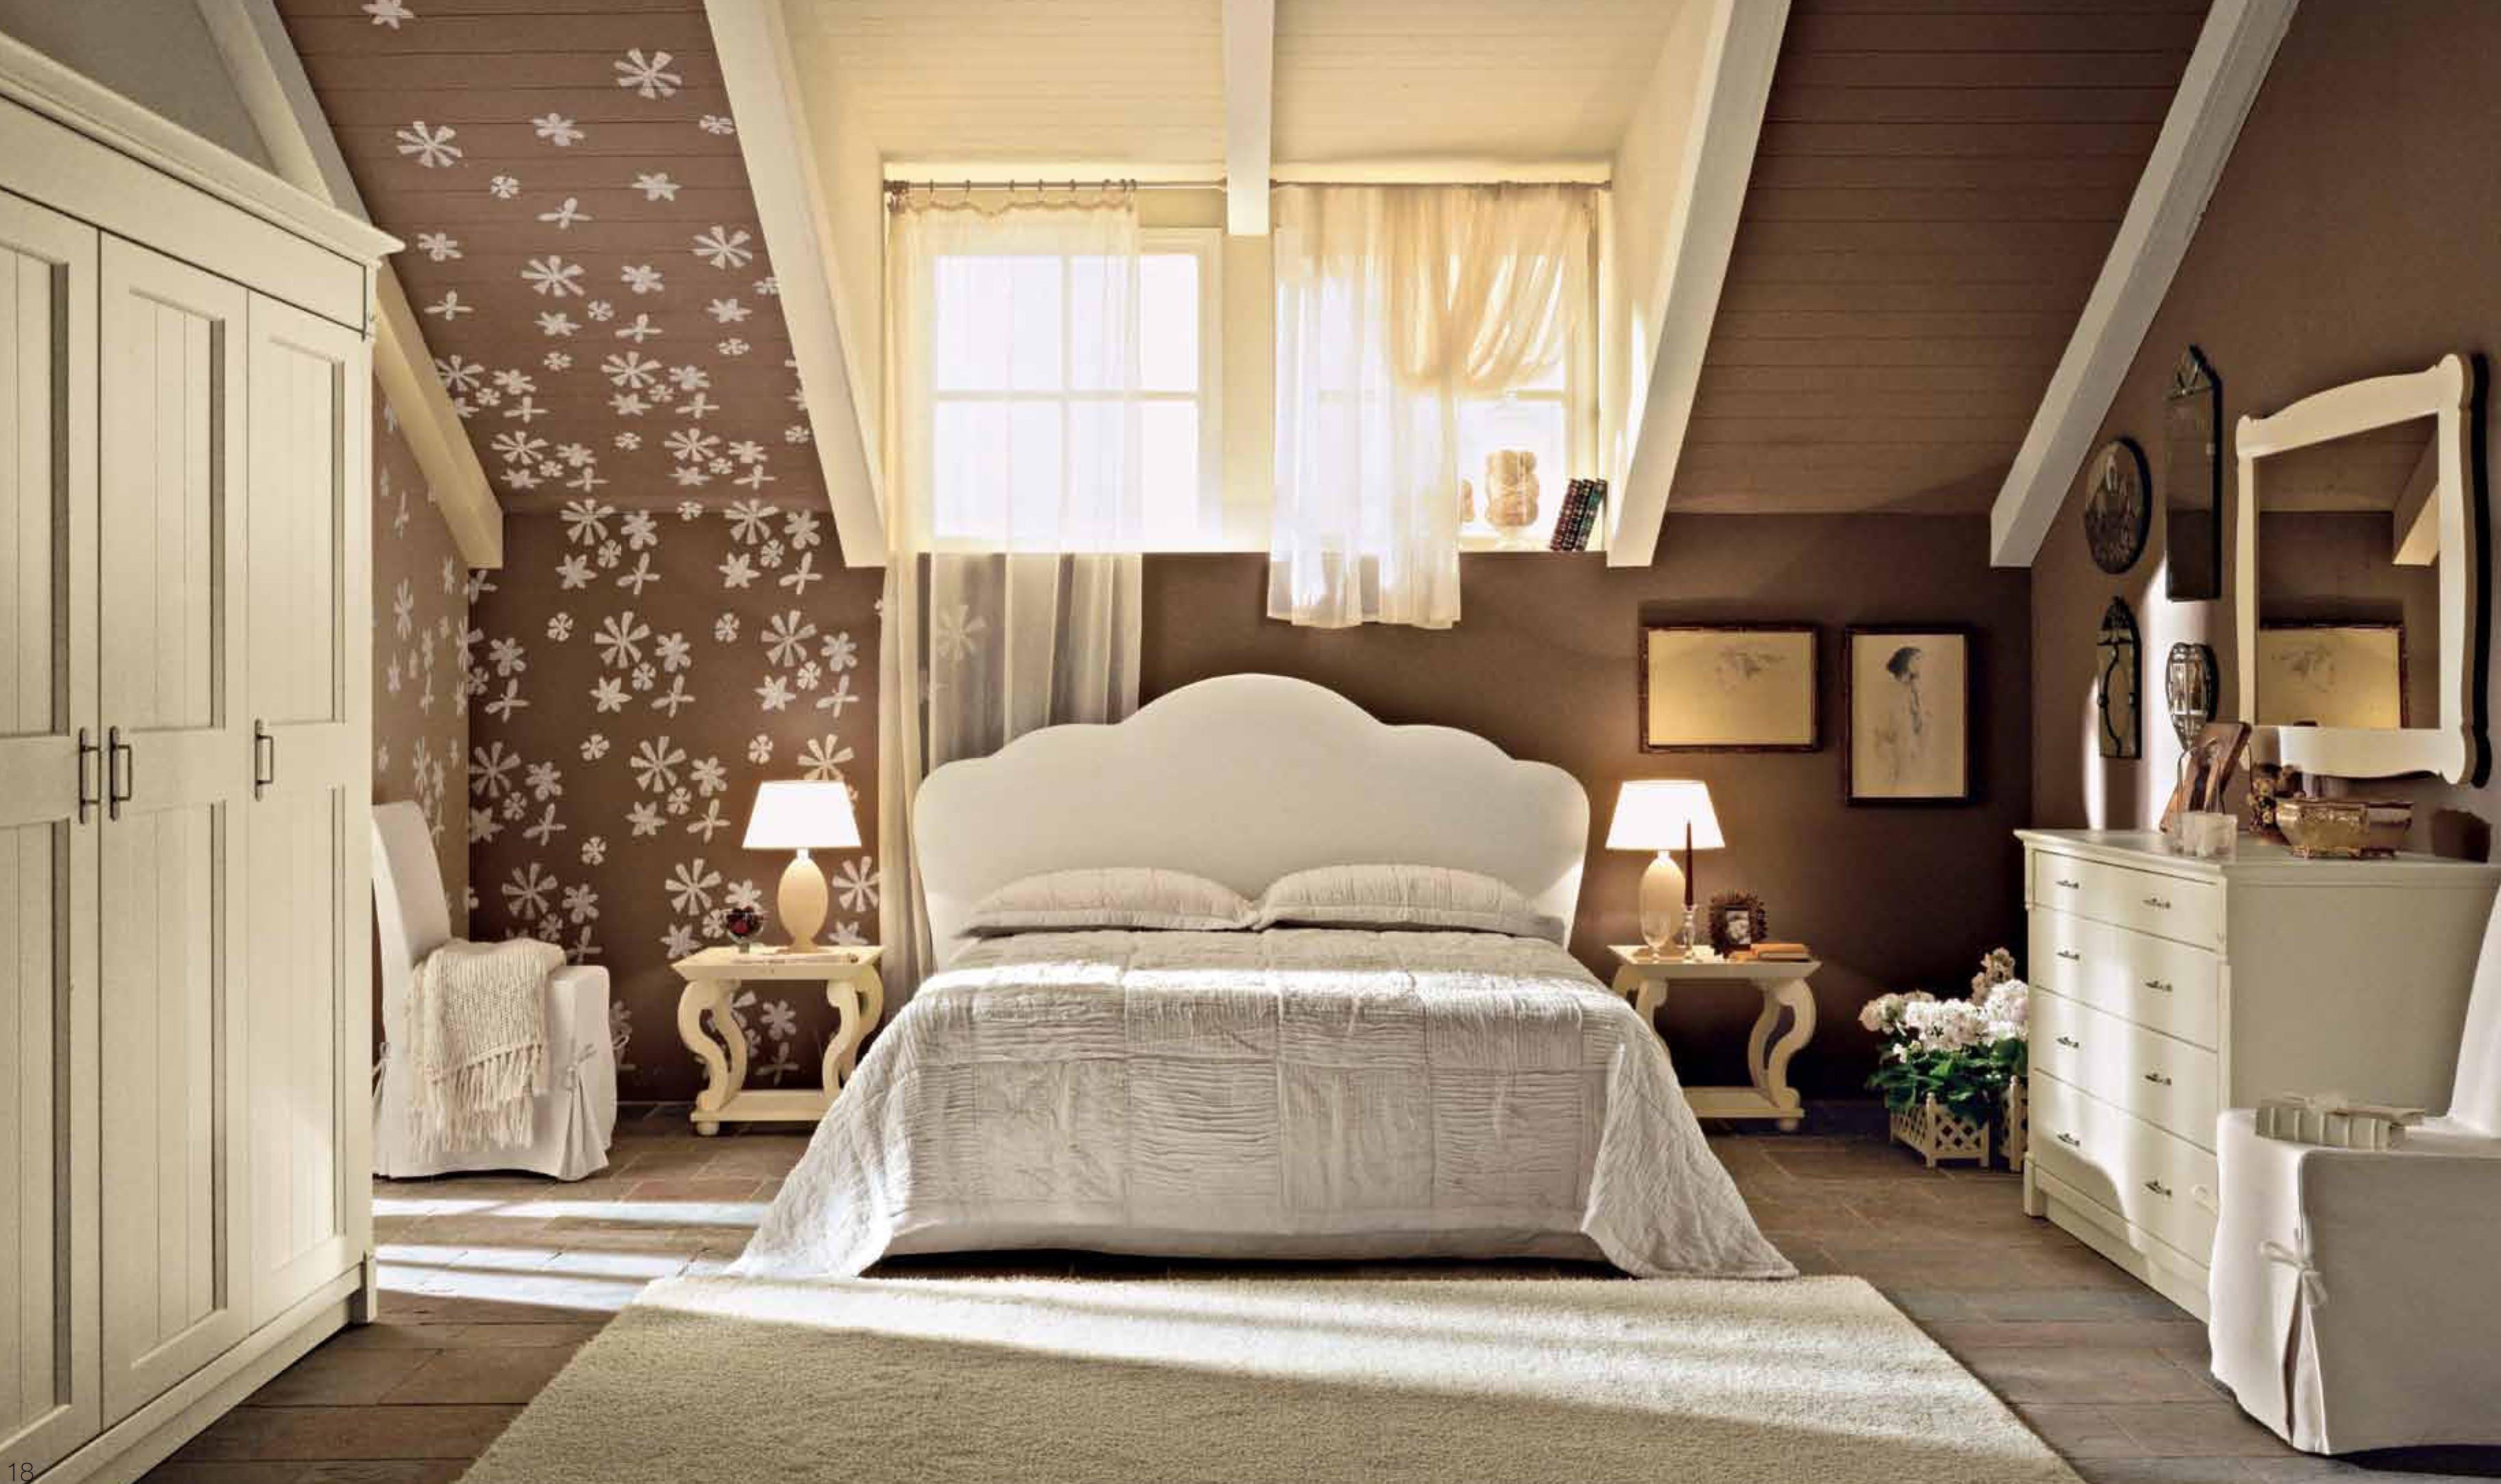 спальня а мансарде в стиле прованса фото